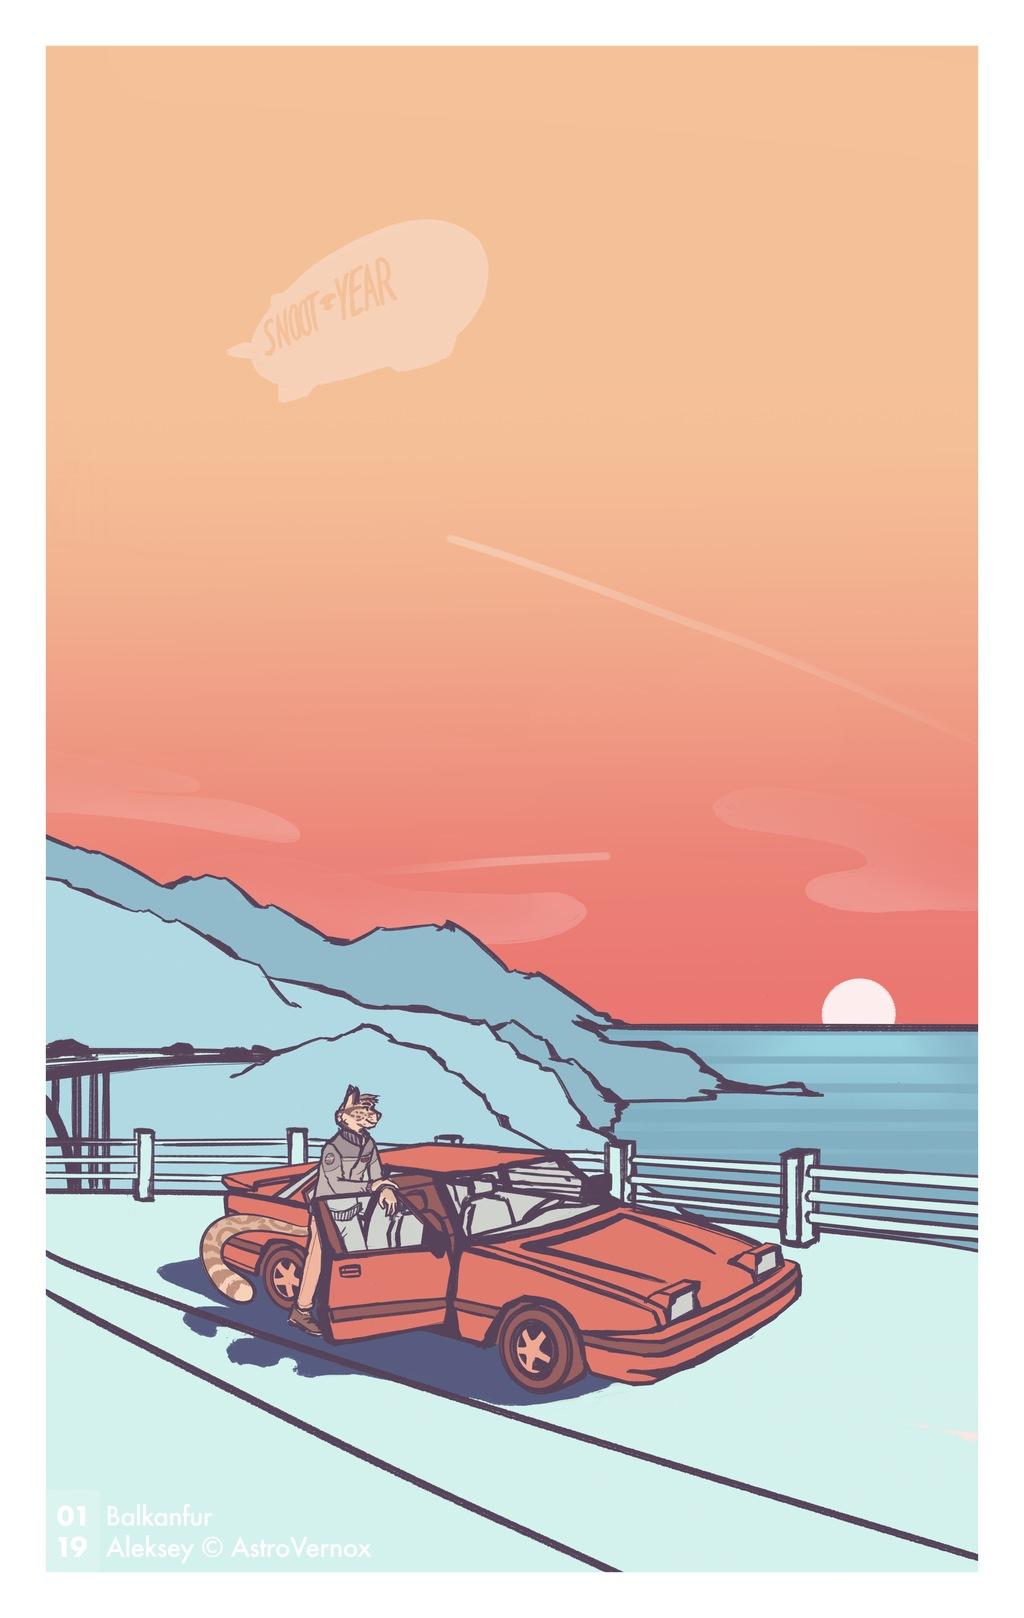 [COMM-ALT] SUNSET DRIVE